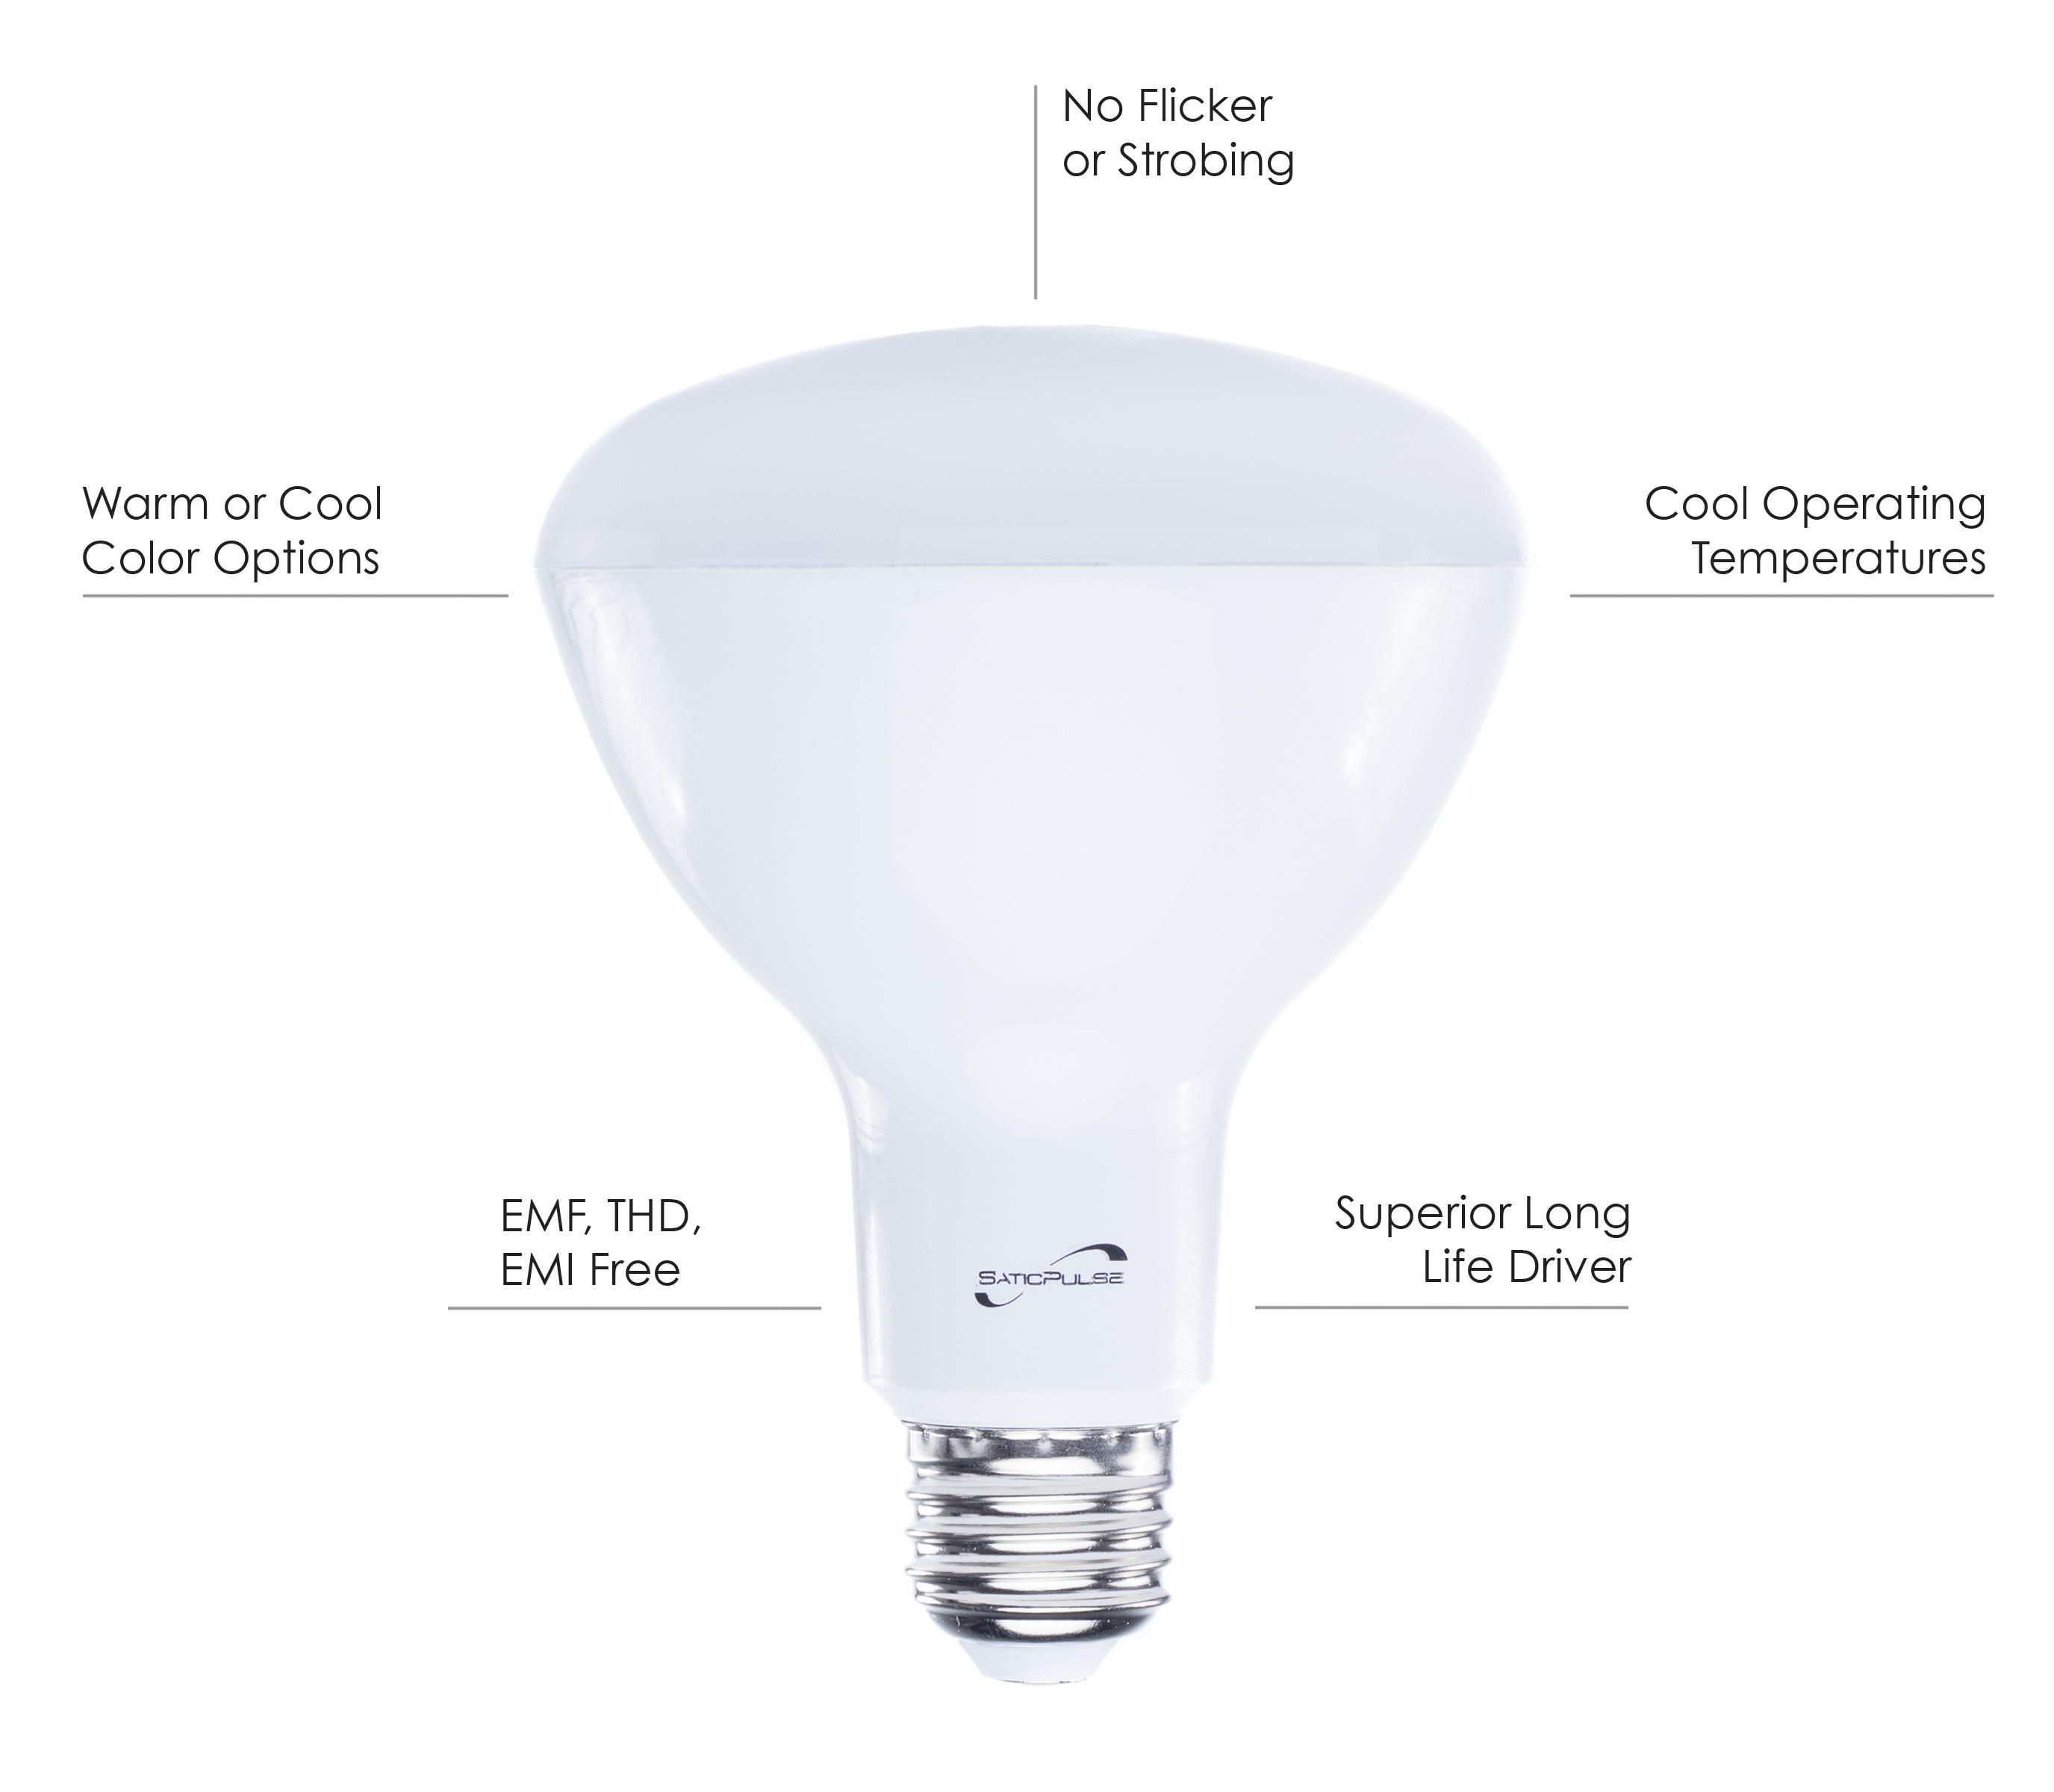 satic-2700light-bulb-graphic.jpg